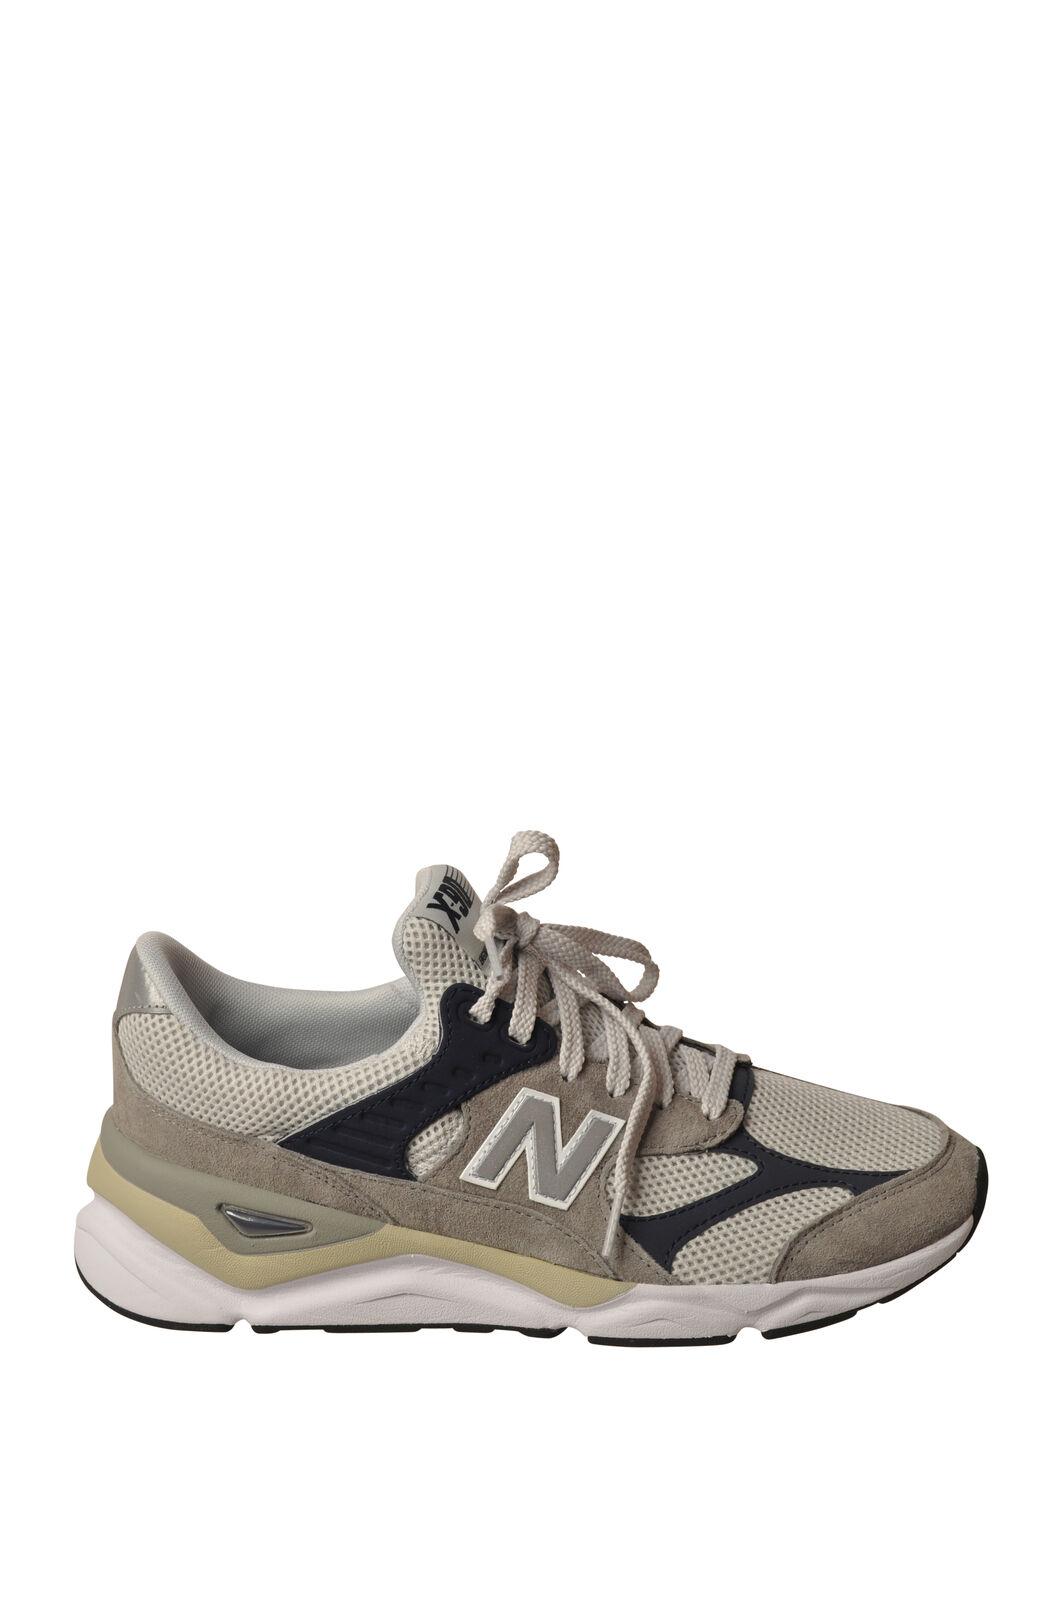 New Balance - zapatos-Lace Up - Man - gris - 6214302F190807